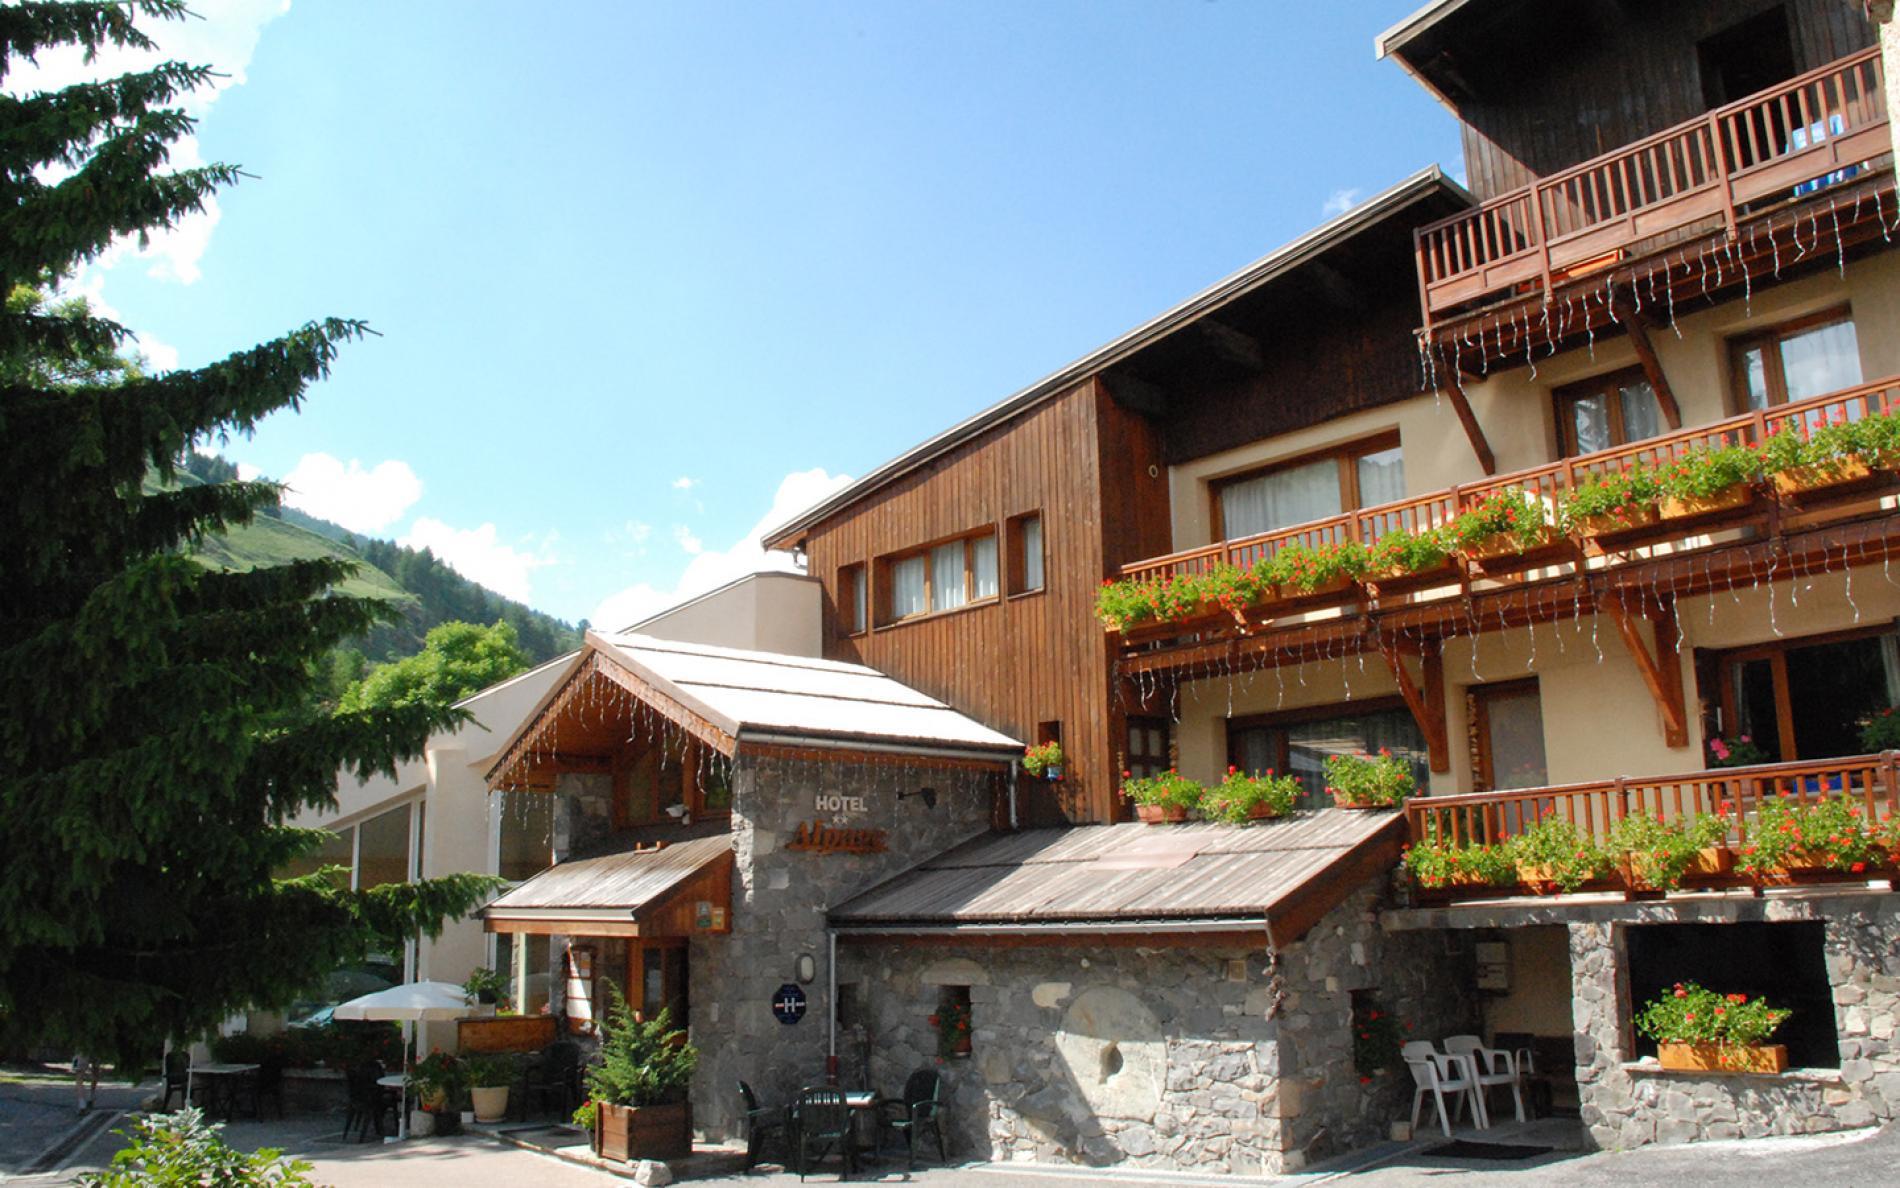 Chalet Hôtel Alpage